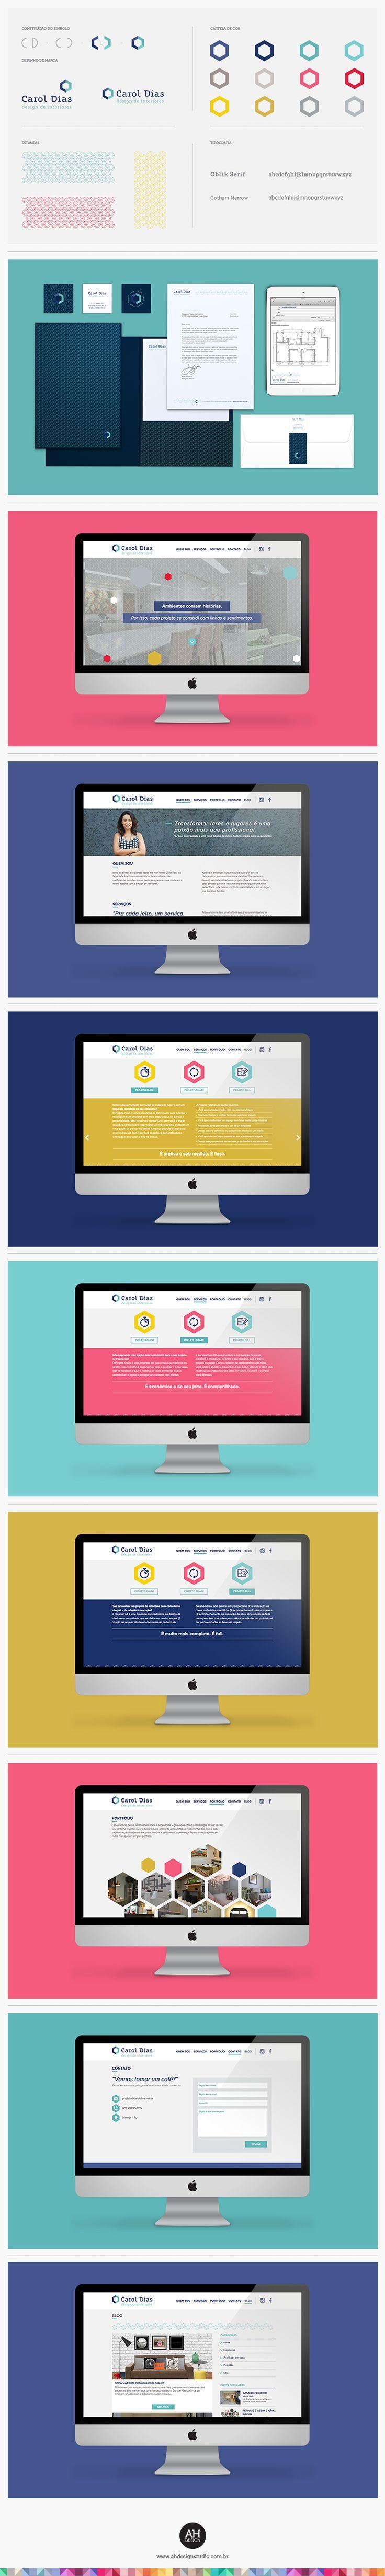 AHdesign Studio, Identidade Visual e Website para Carol Dias #webdesign #website #portfolio #singlepage #onepagewebsites #webpagelayout #digitaldesign #ux #design #desenhodemarca #idvisual #branding #logodesign #logomarca #graphicdesign #ahdesignstudio #caroldias